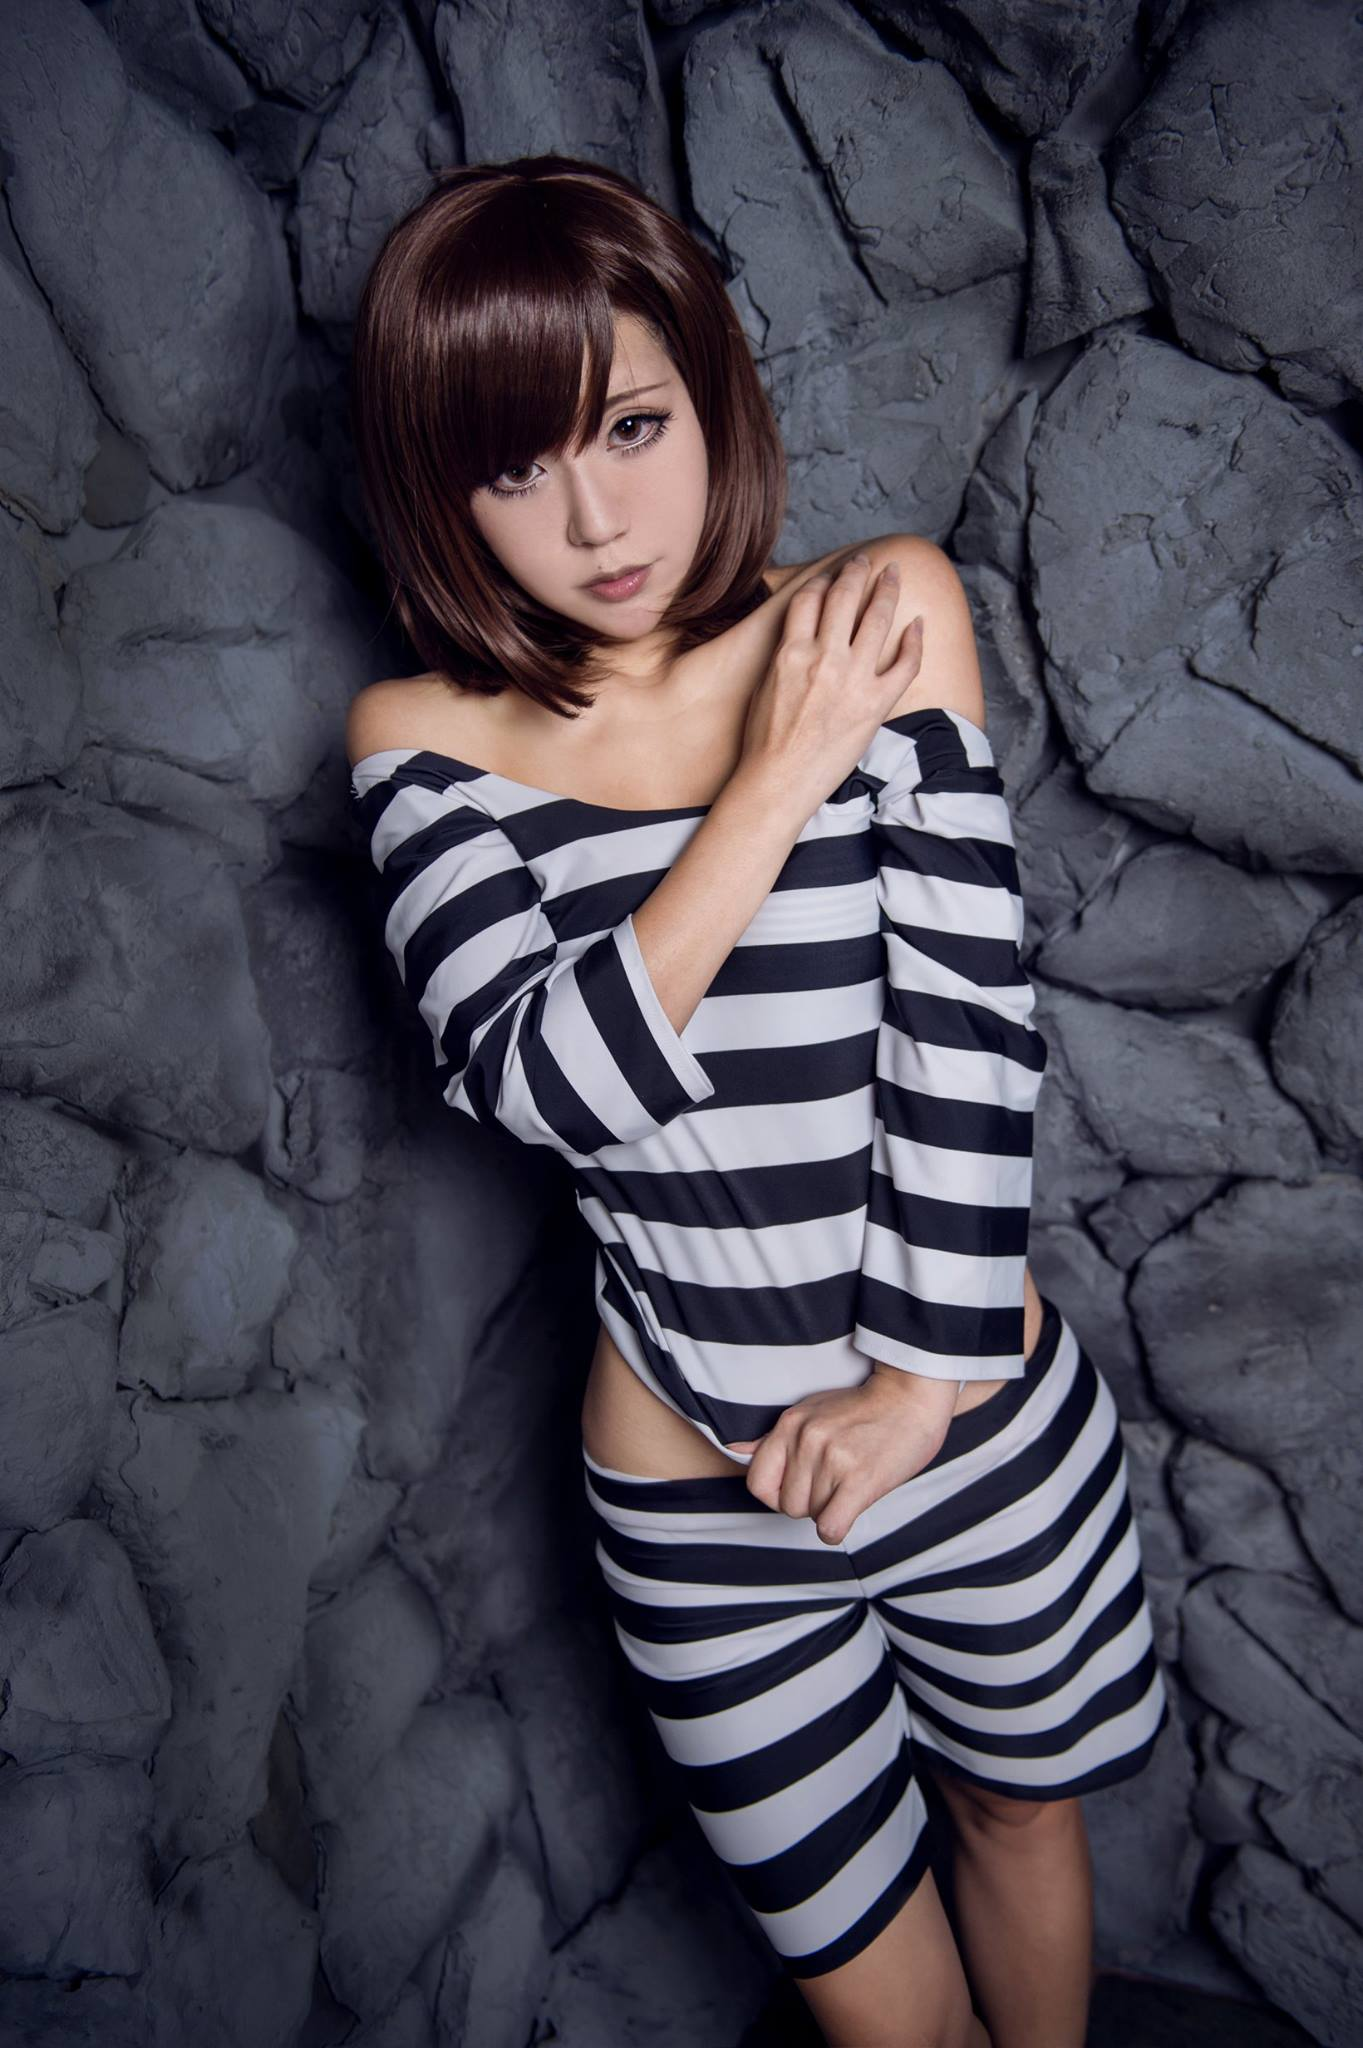 Ulkhror on Twitter: Very sexy 監獄學園 Prison School #cosplay